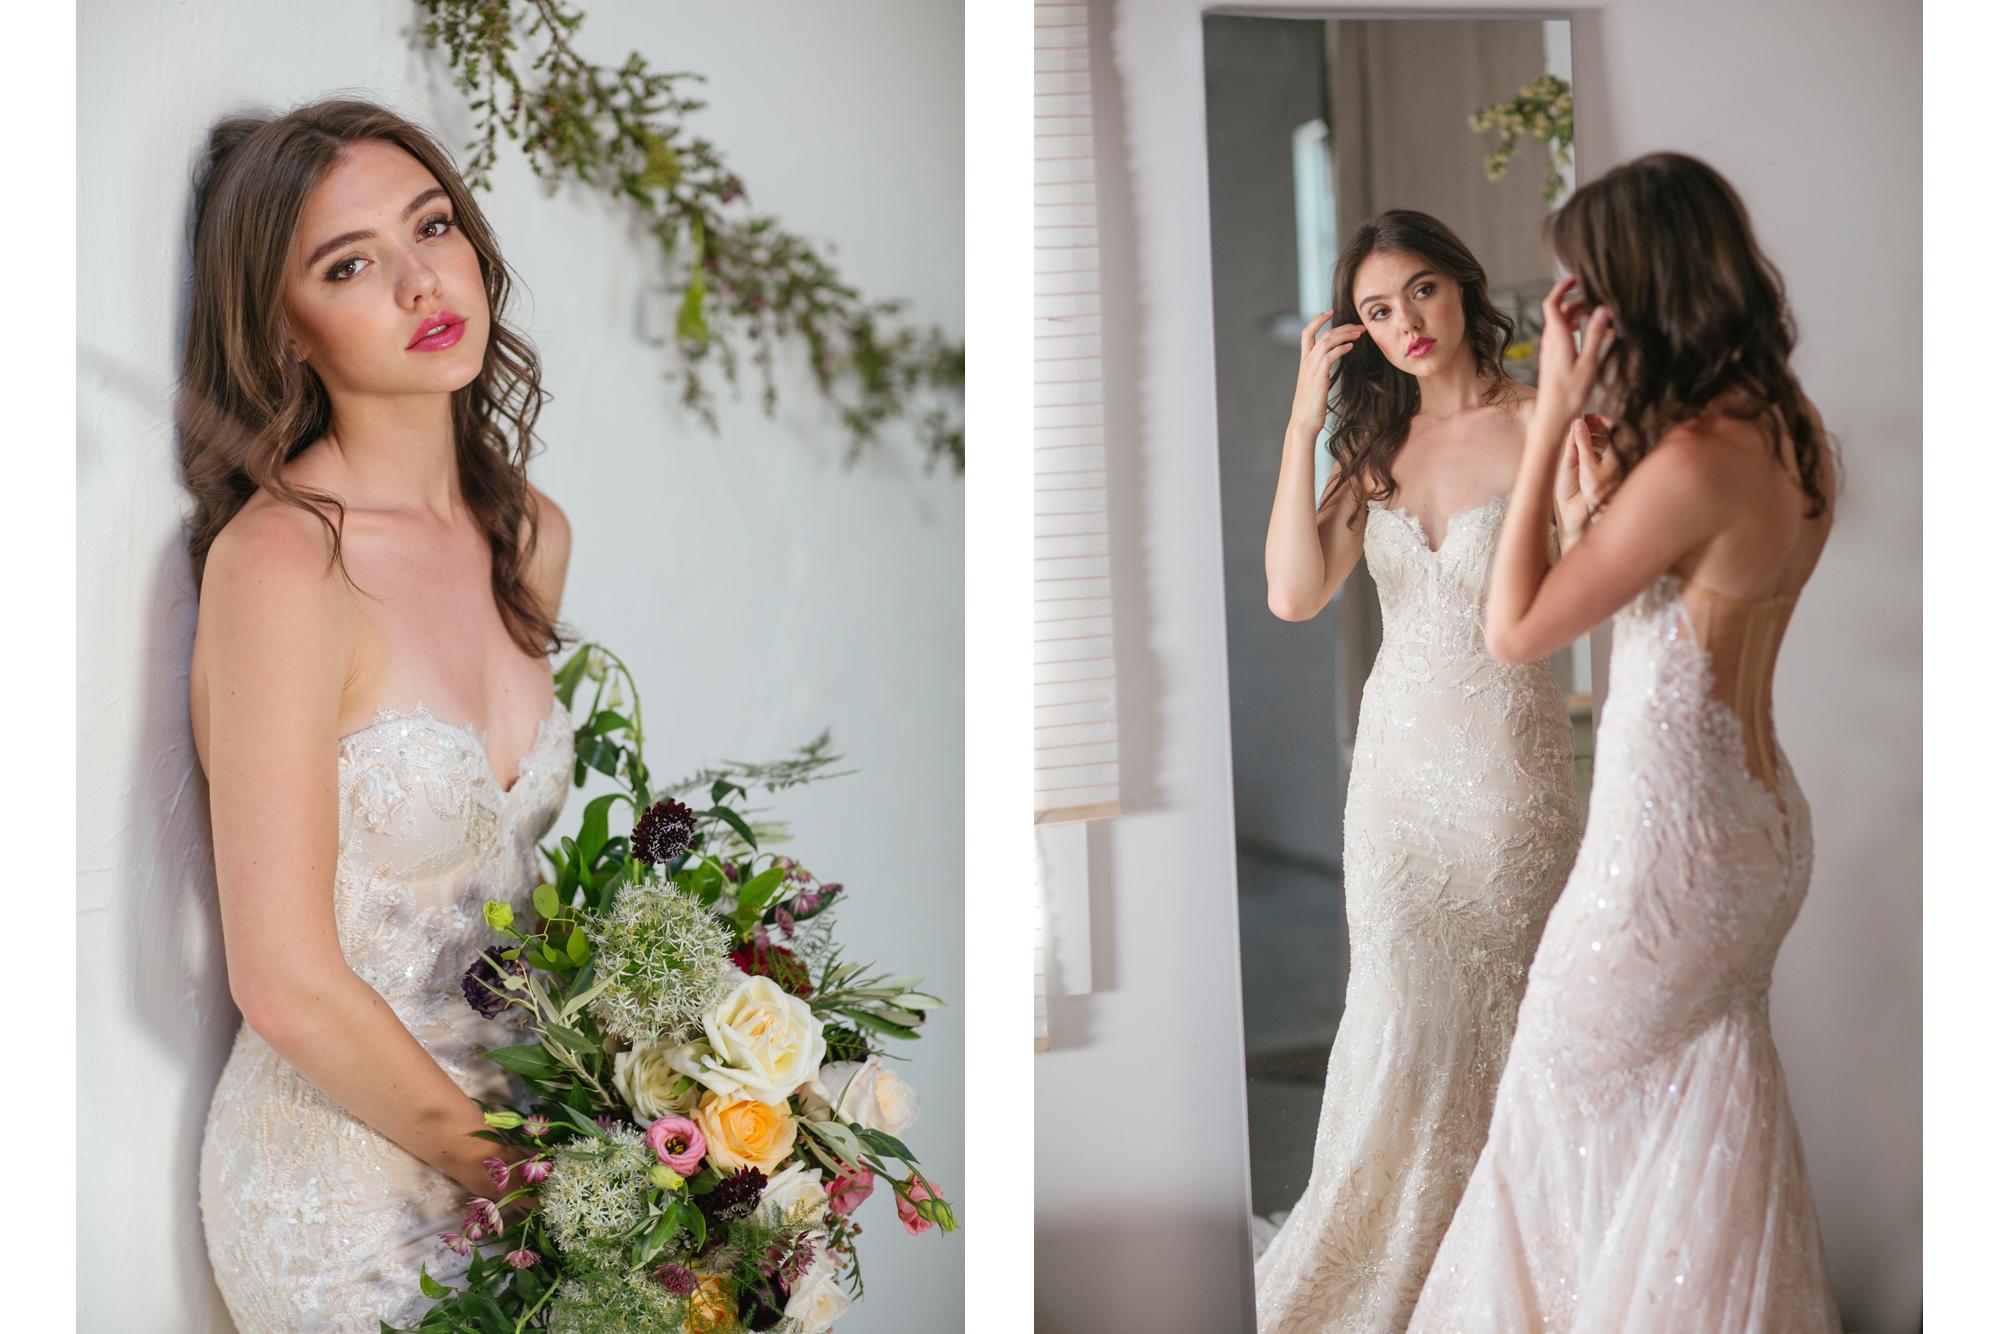 vancouver-luxury-wedding-photographer-lori-miles-34.jpg